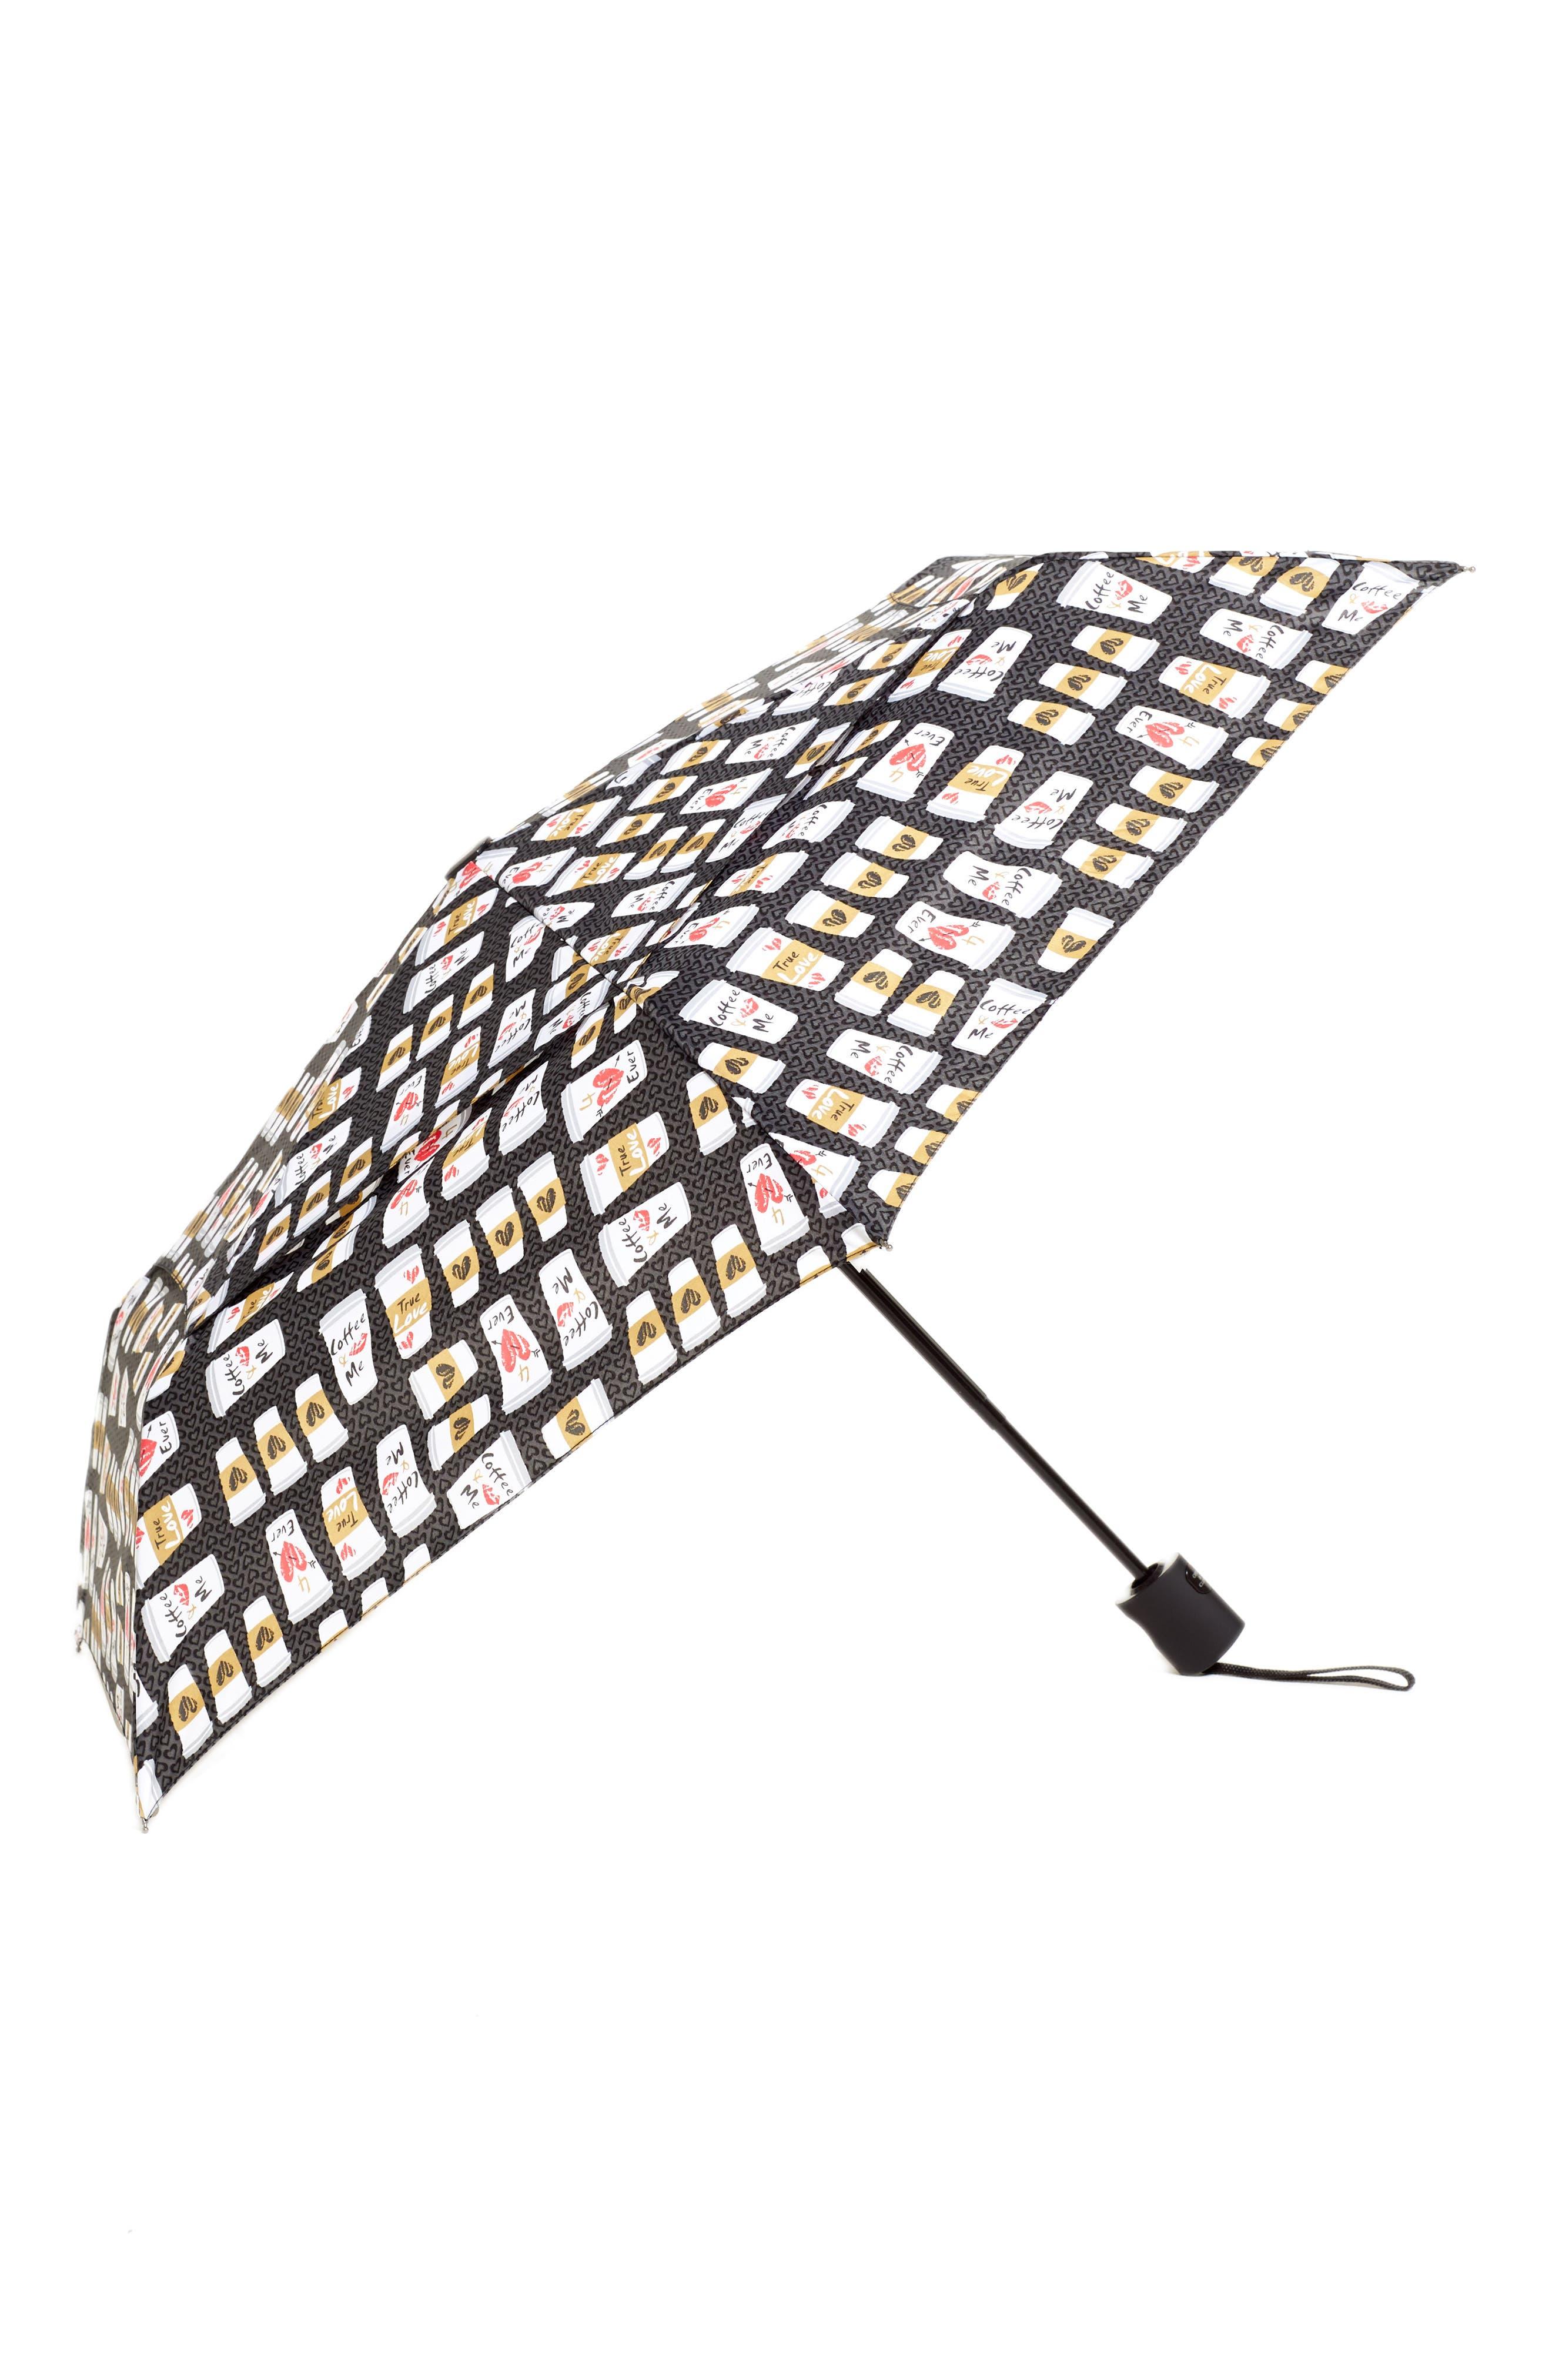 WindPro<sup>®</sup> Auto Open & Close Umbrella,                         Main,                         color, NORD BREWED